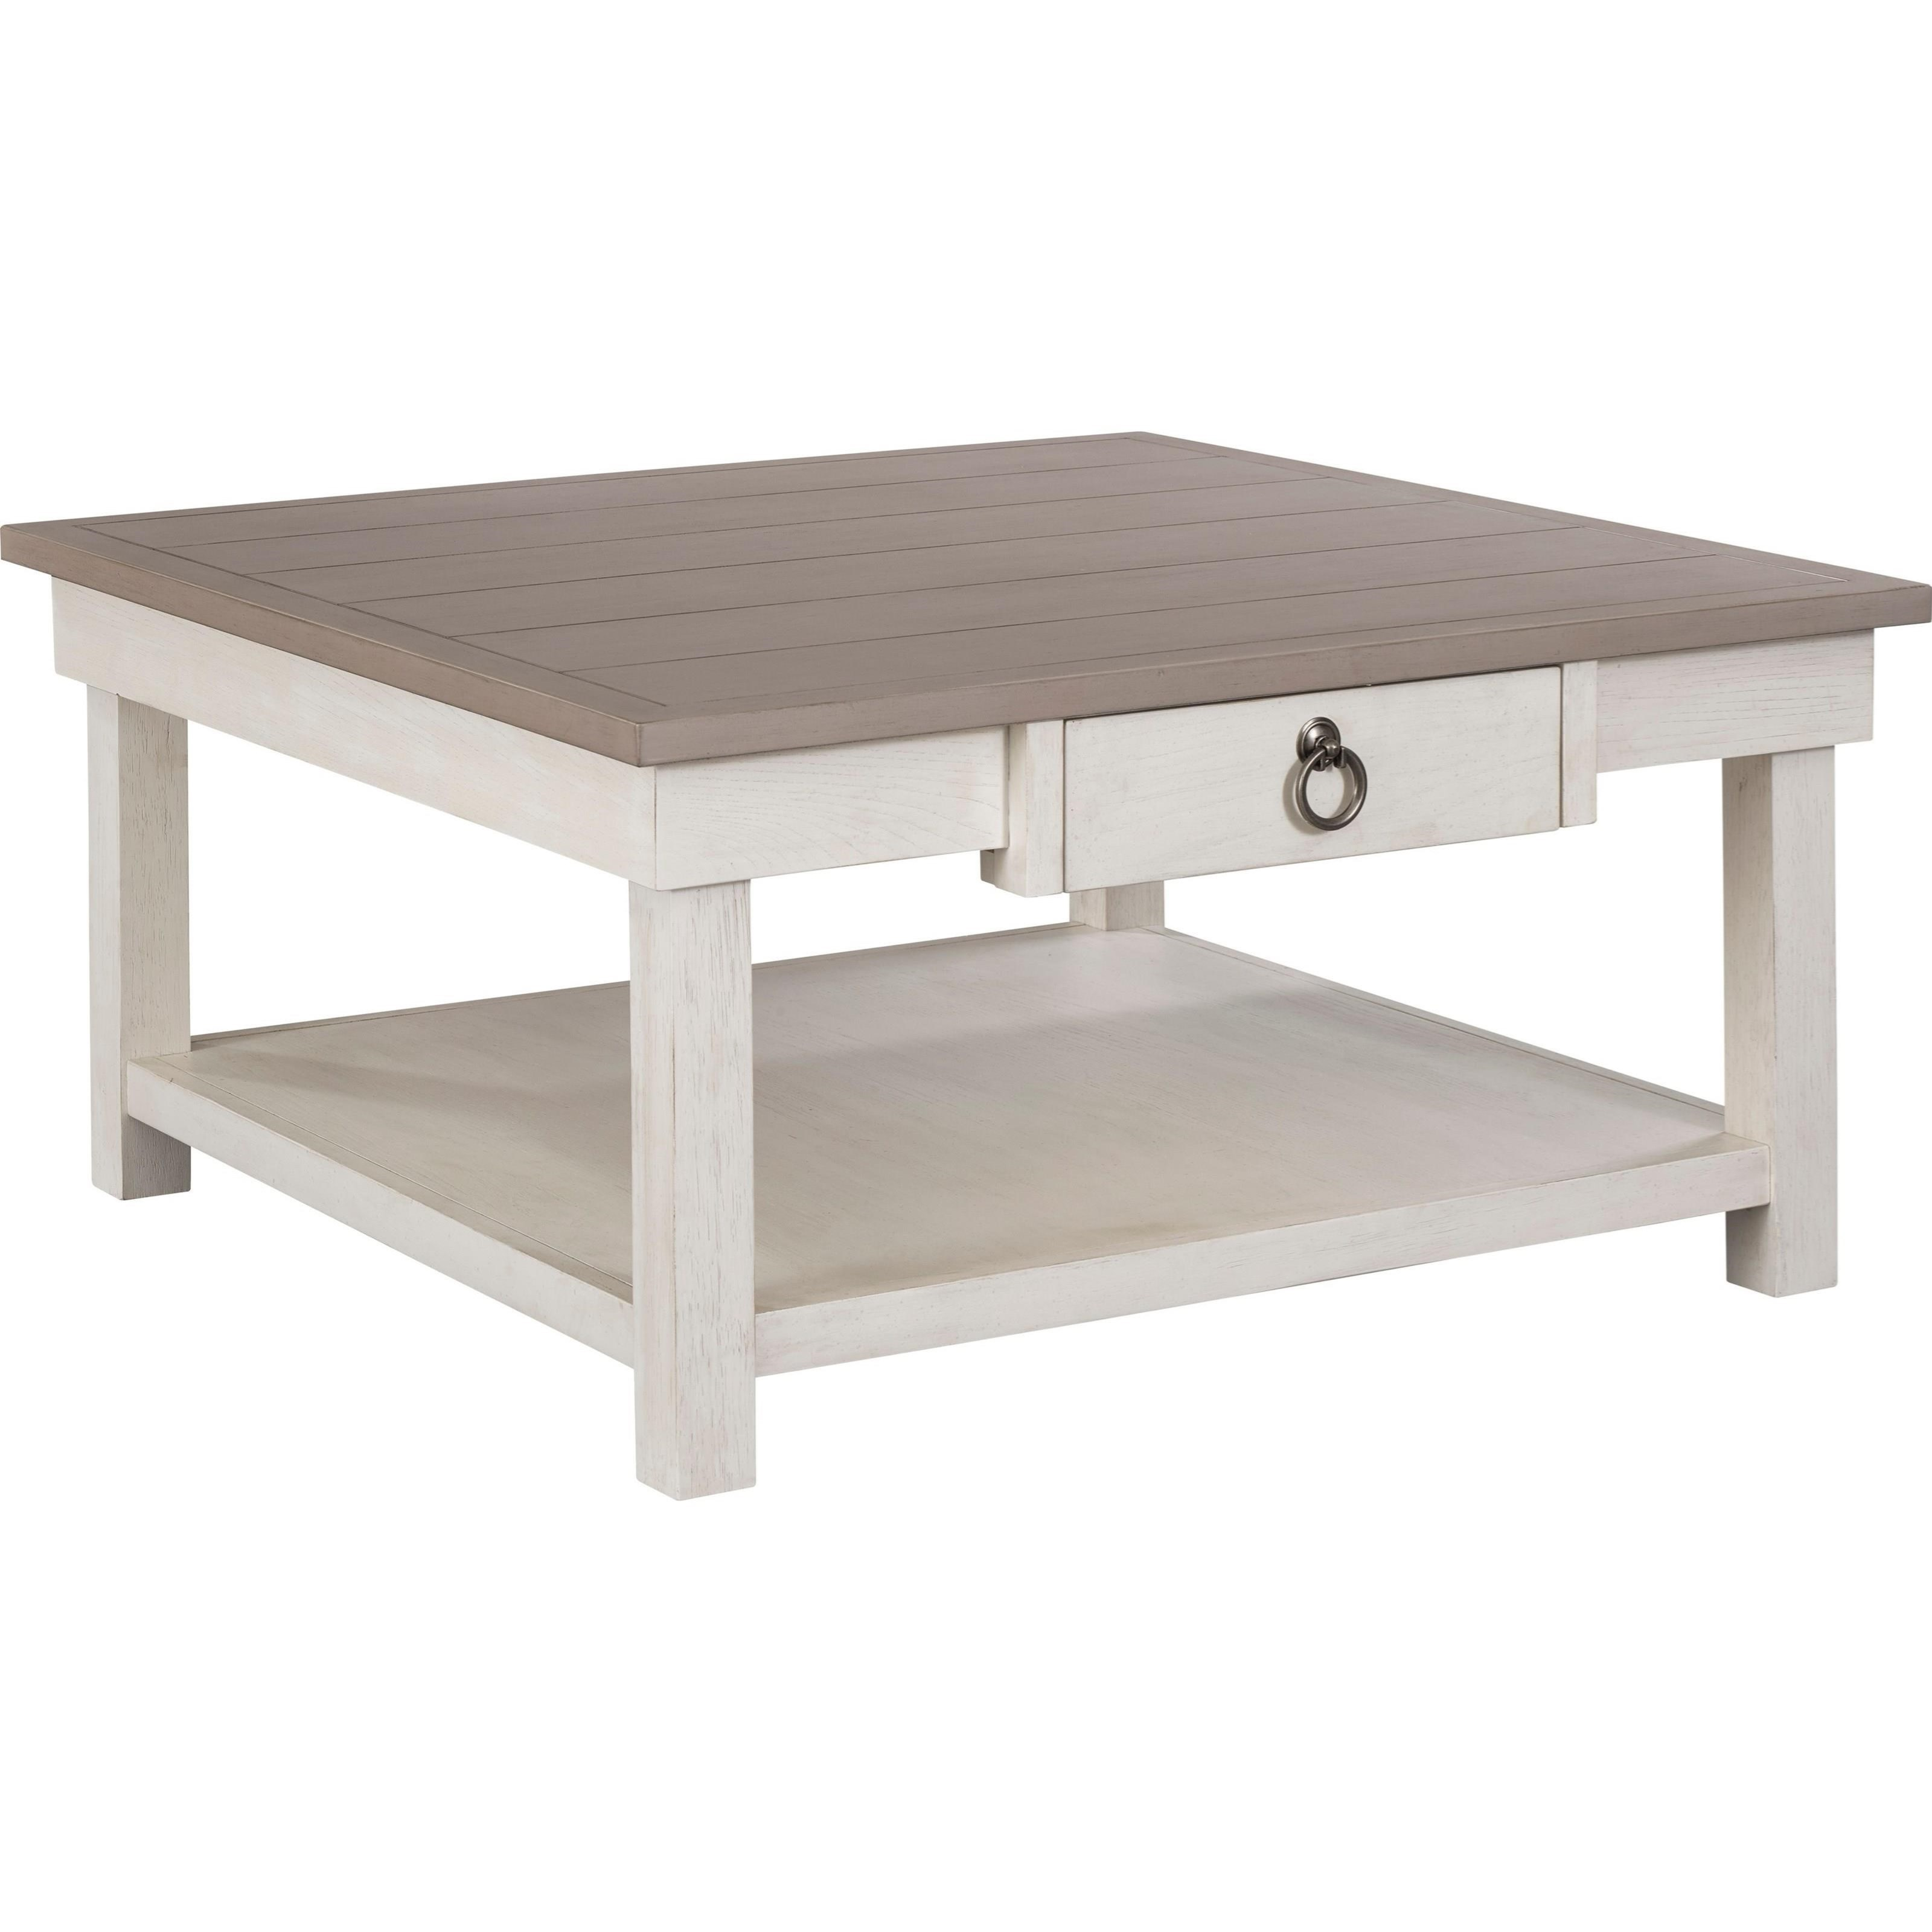 Broyhill Furniture Ashgrove 4547 013wh Pu 1 Drawer Square